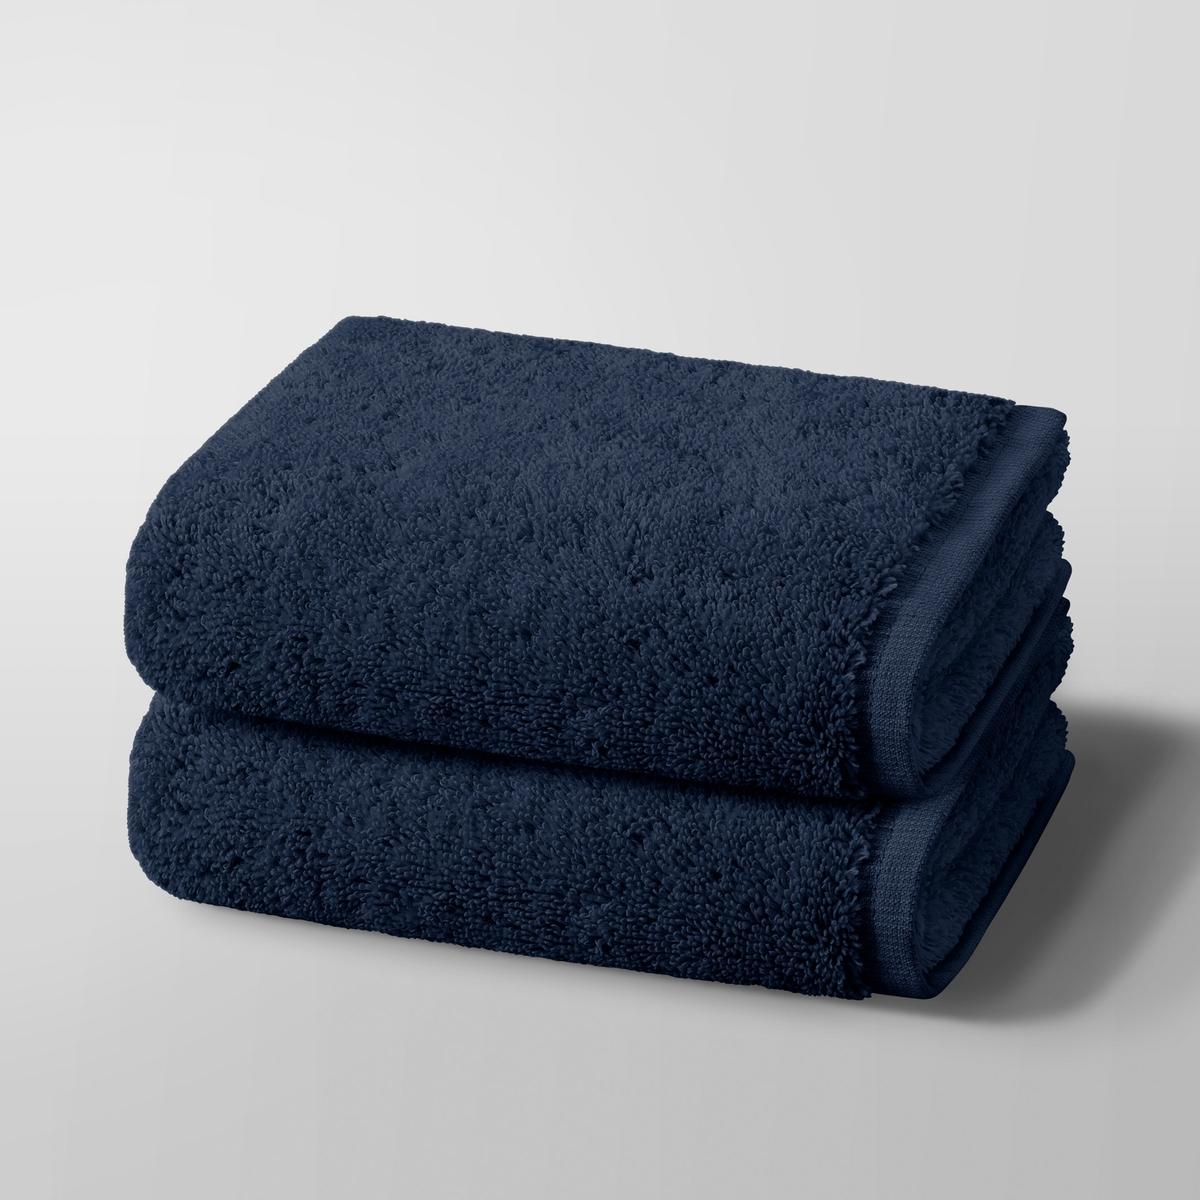 2 полотенца гостевых Gilbear